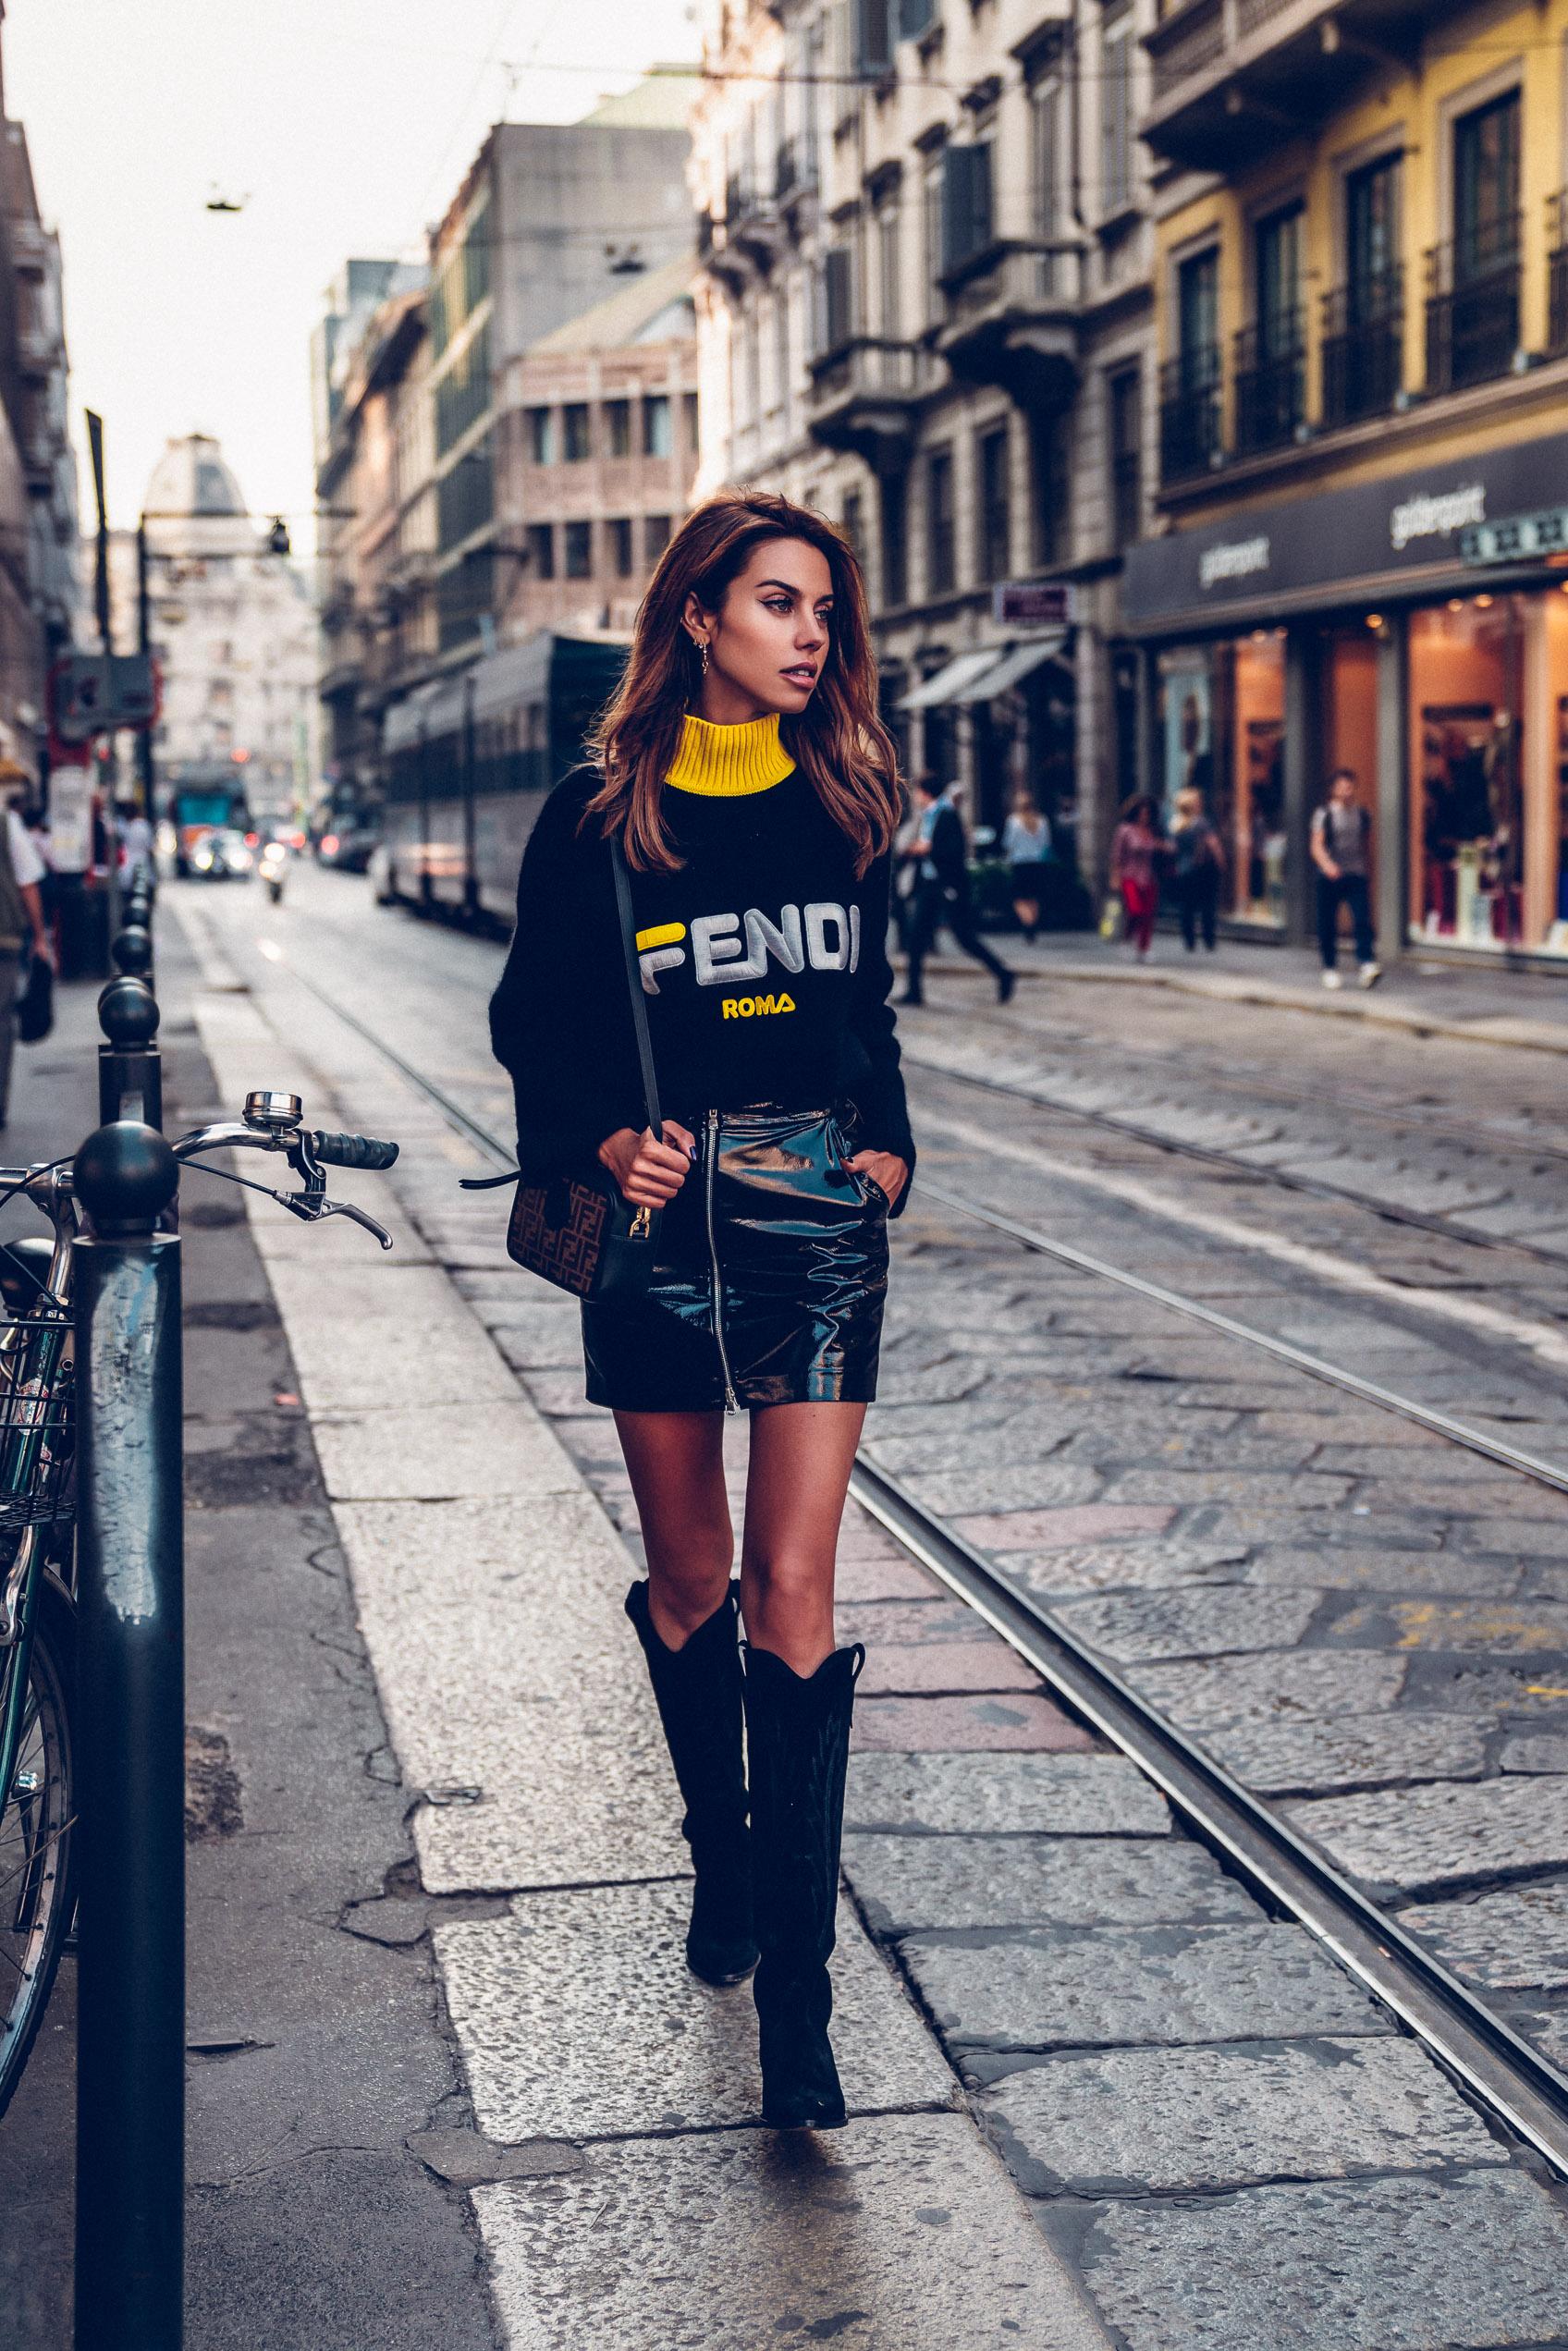 Image result for fendi camerabag street style